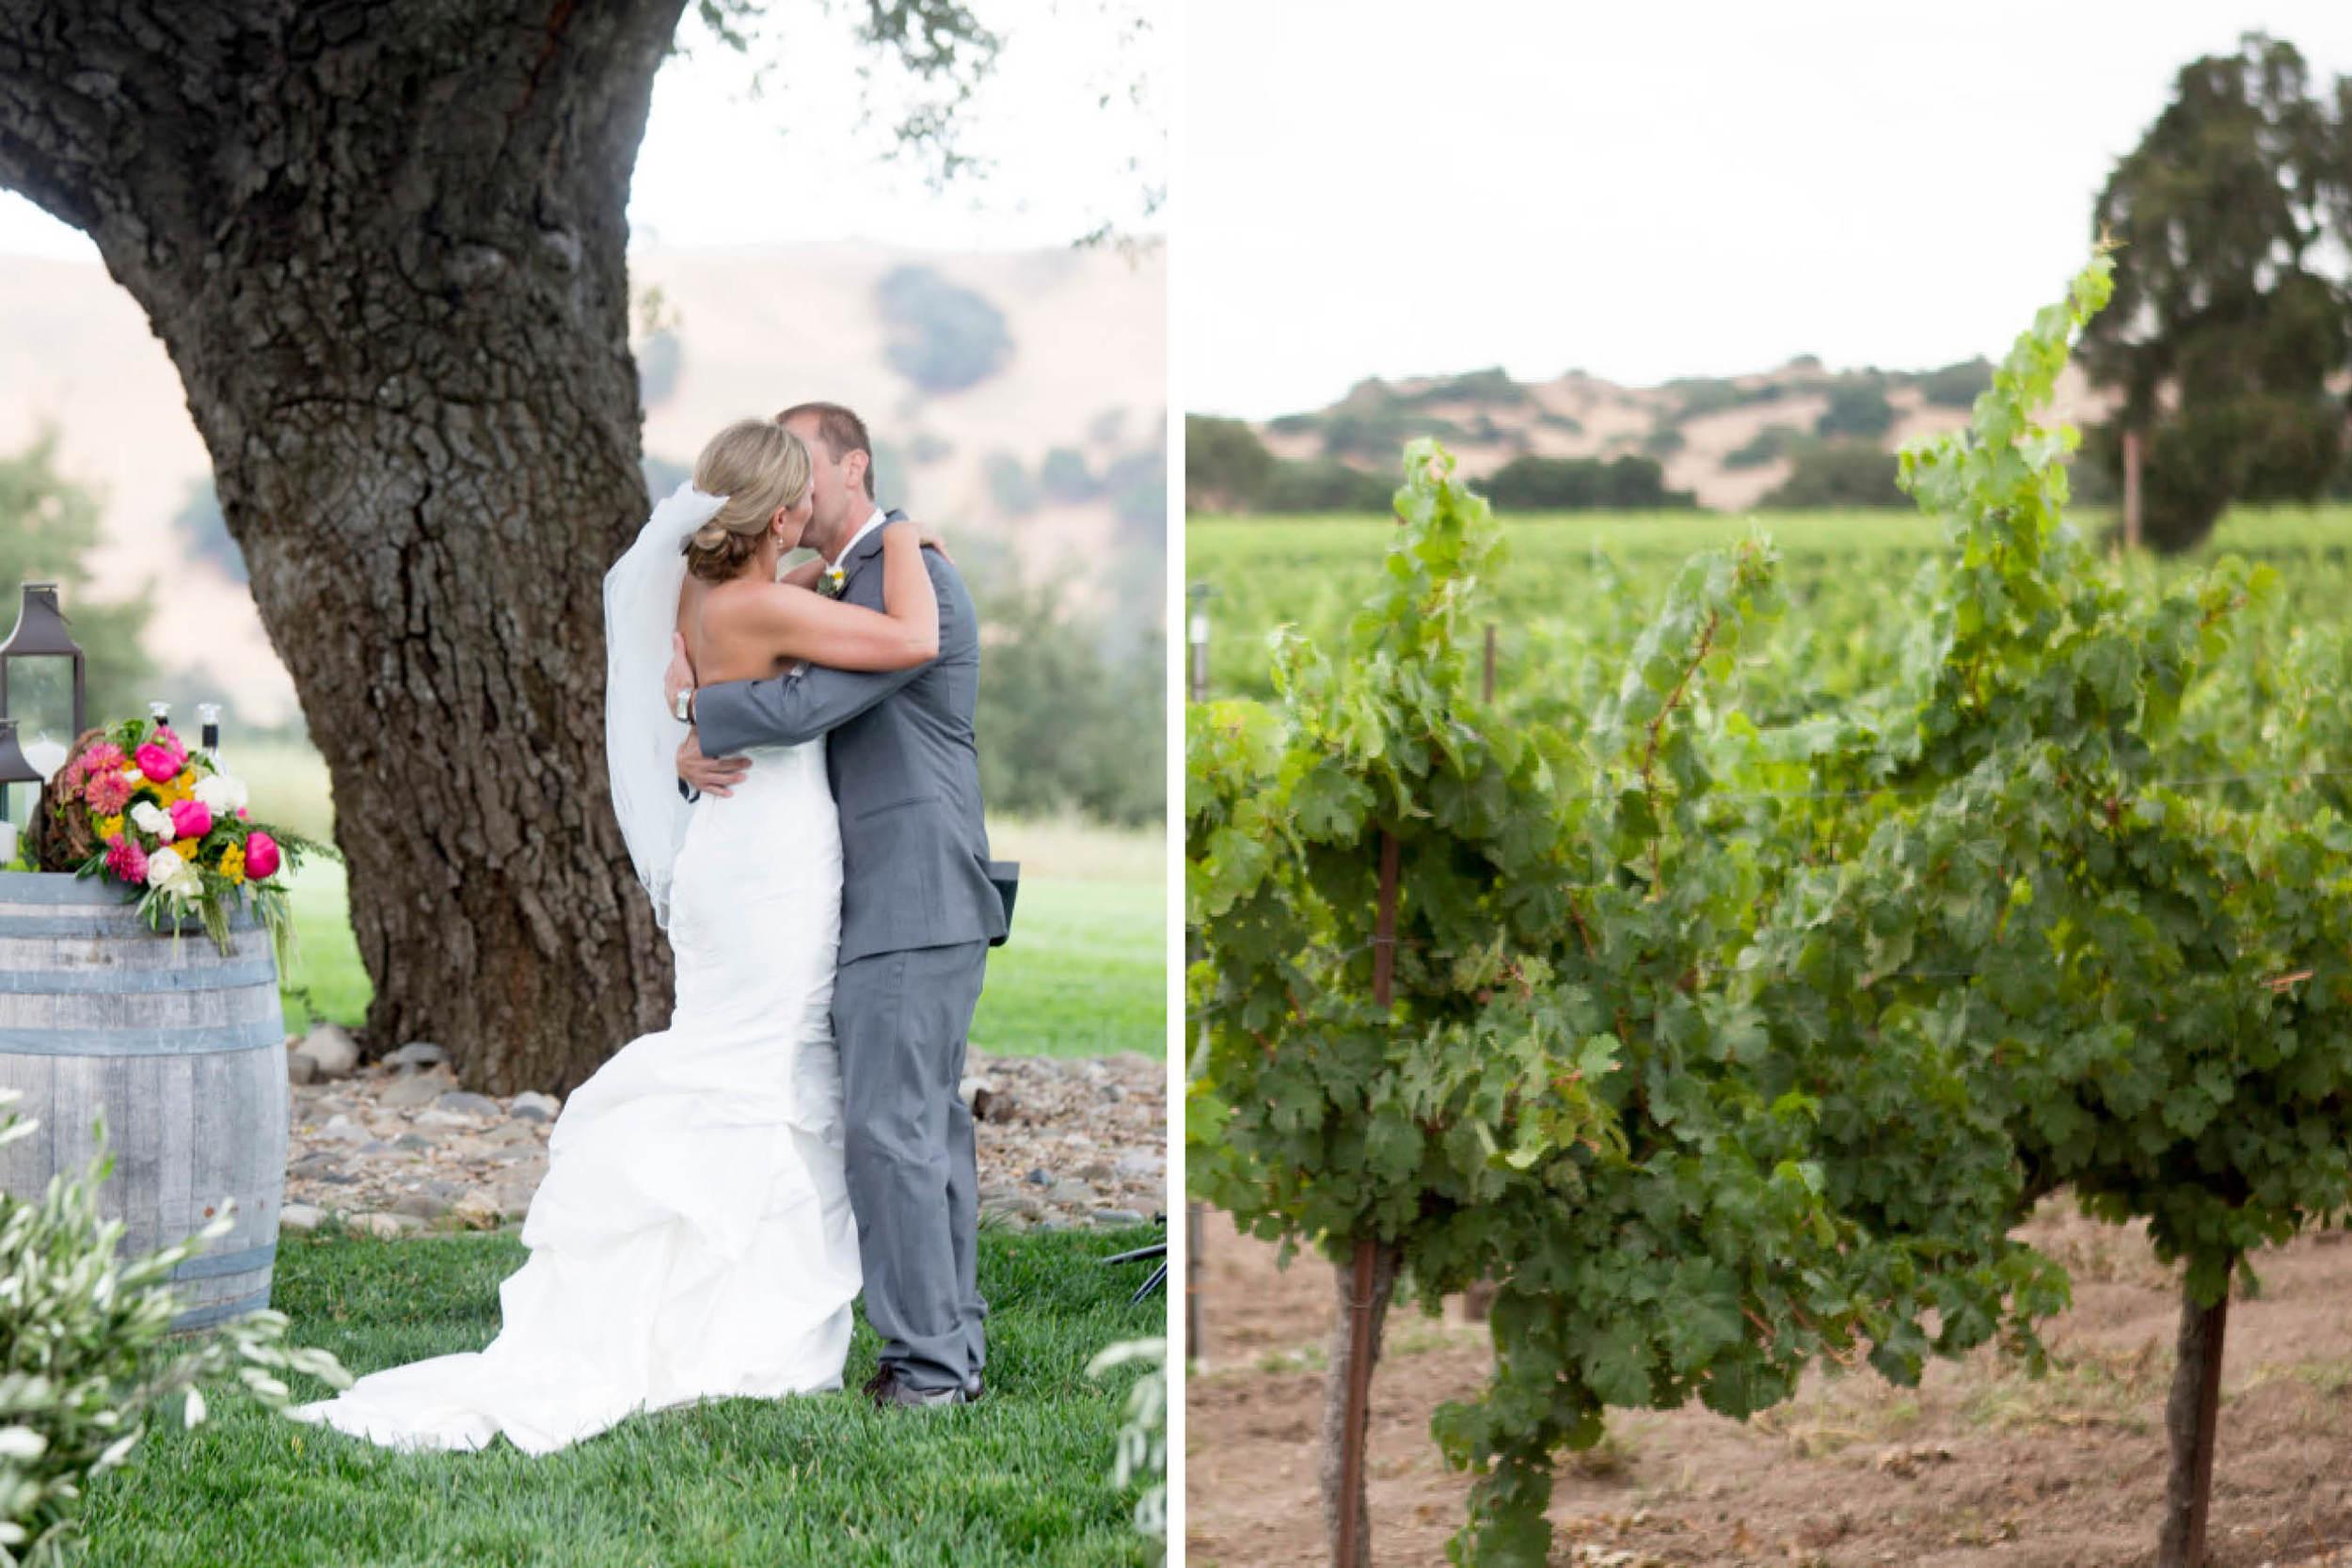 firestone-winery-vineyard-wedding-planner-coordinator-santa-barbara-ynez-los-olivos (17).jpg